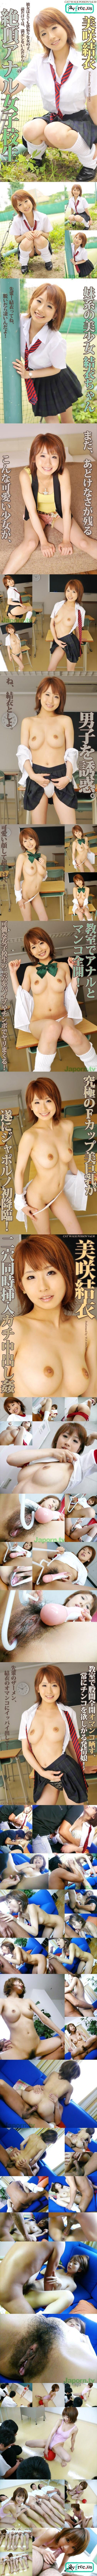 [CWP 30] CATWALK POISON 30 : 美咲結衣(Yui Misaki) CWP